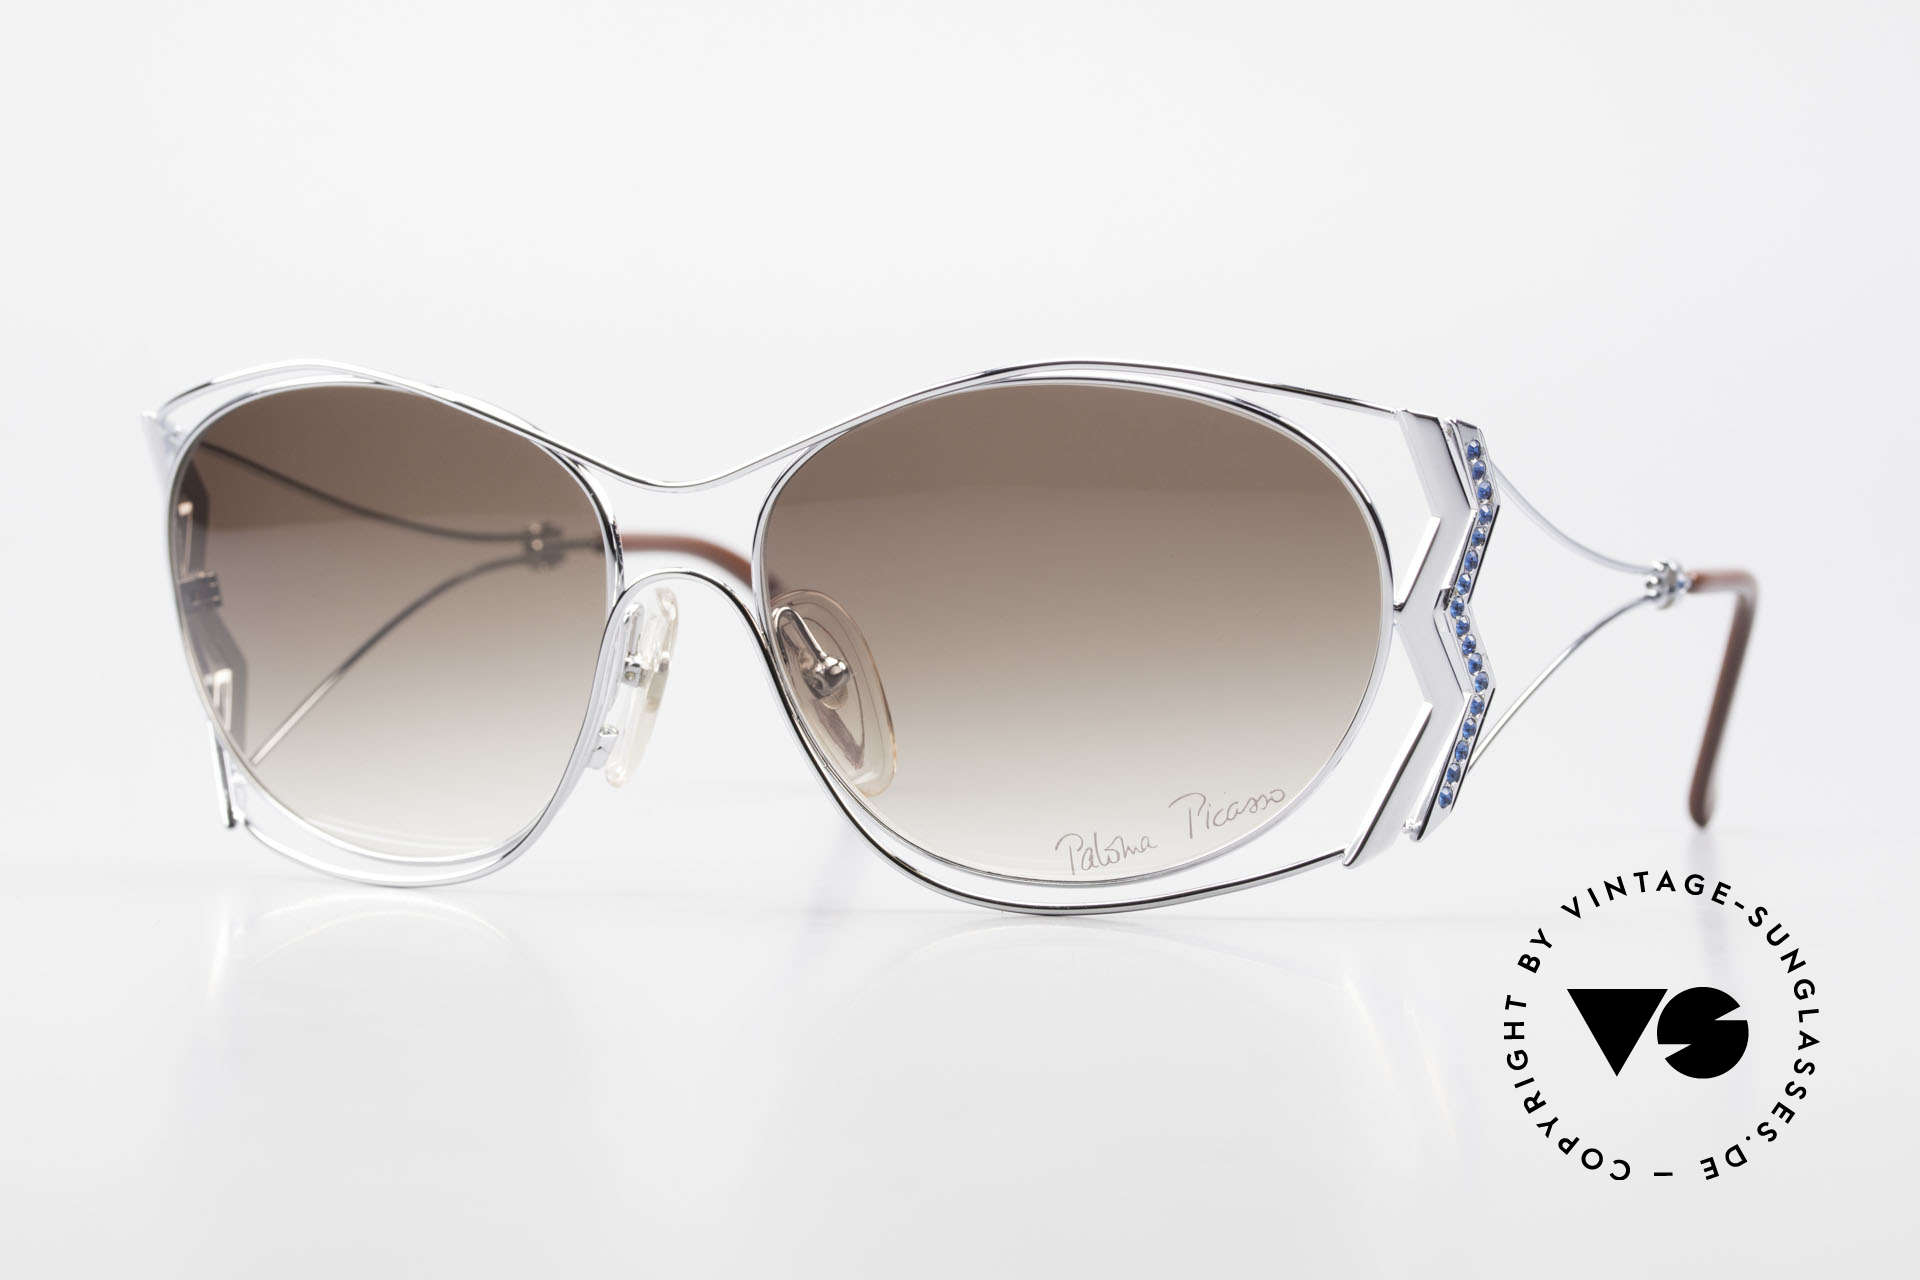 Paloma Picasso 3707 90er Strass-Sonnenbrille Capri, 90er Damen Sonnenbrille, mit Strass in Capri-Blau, Passend für Damen